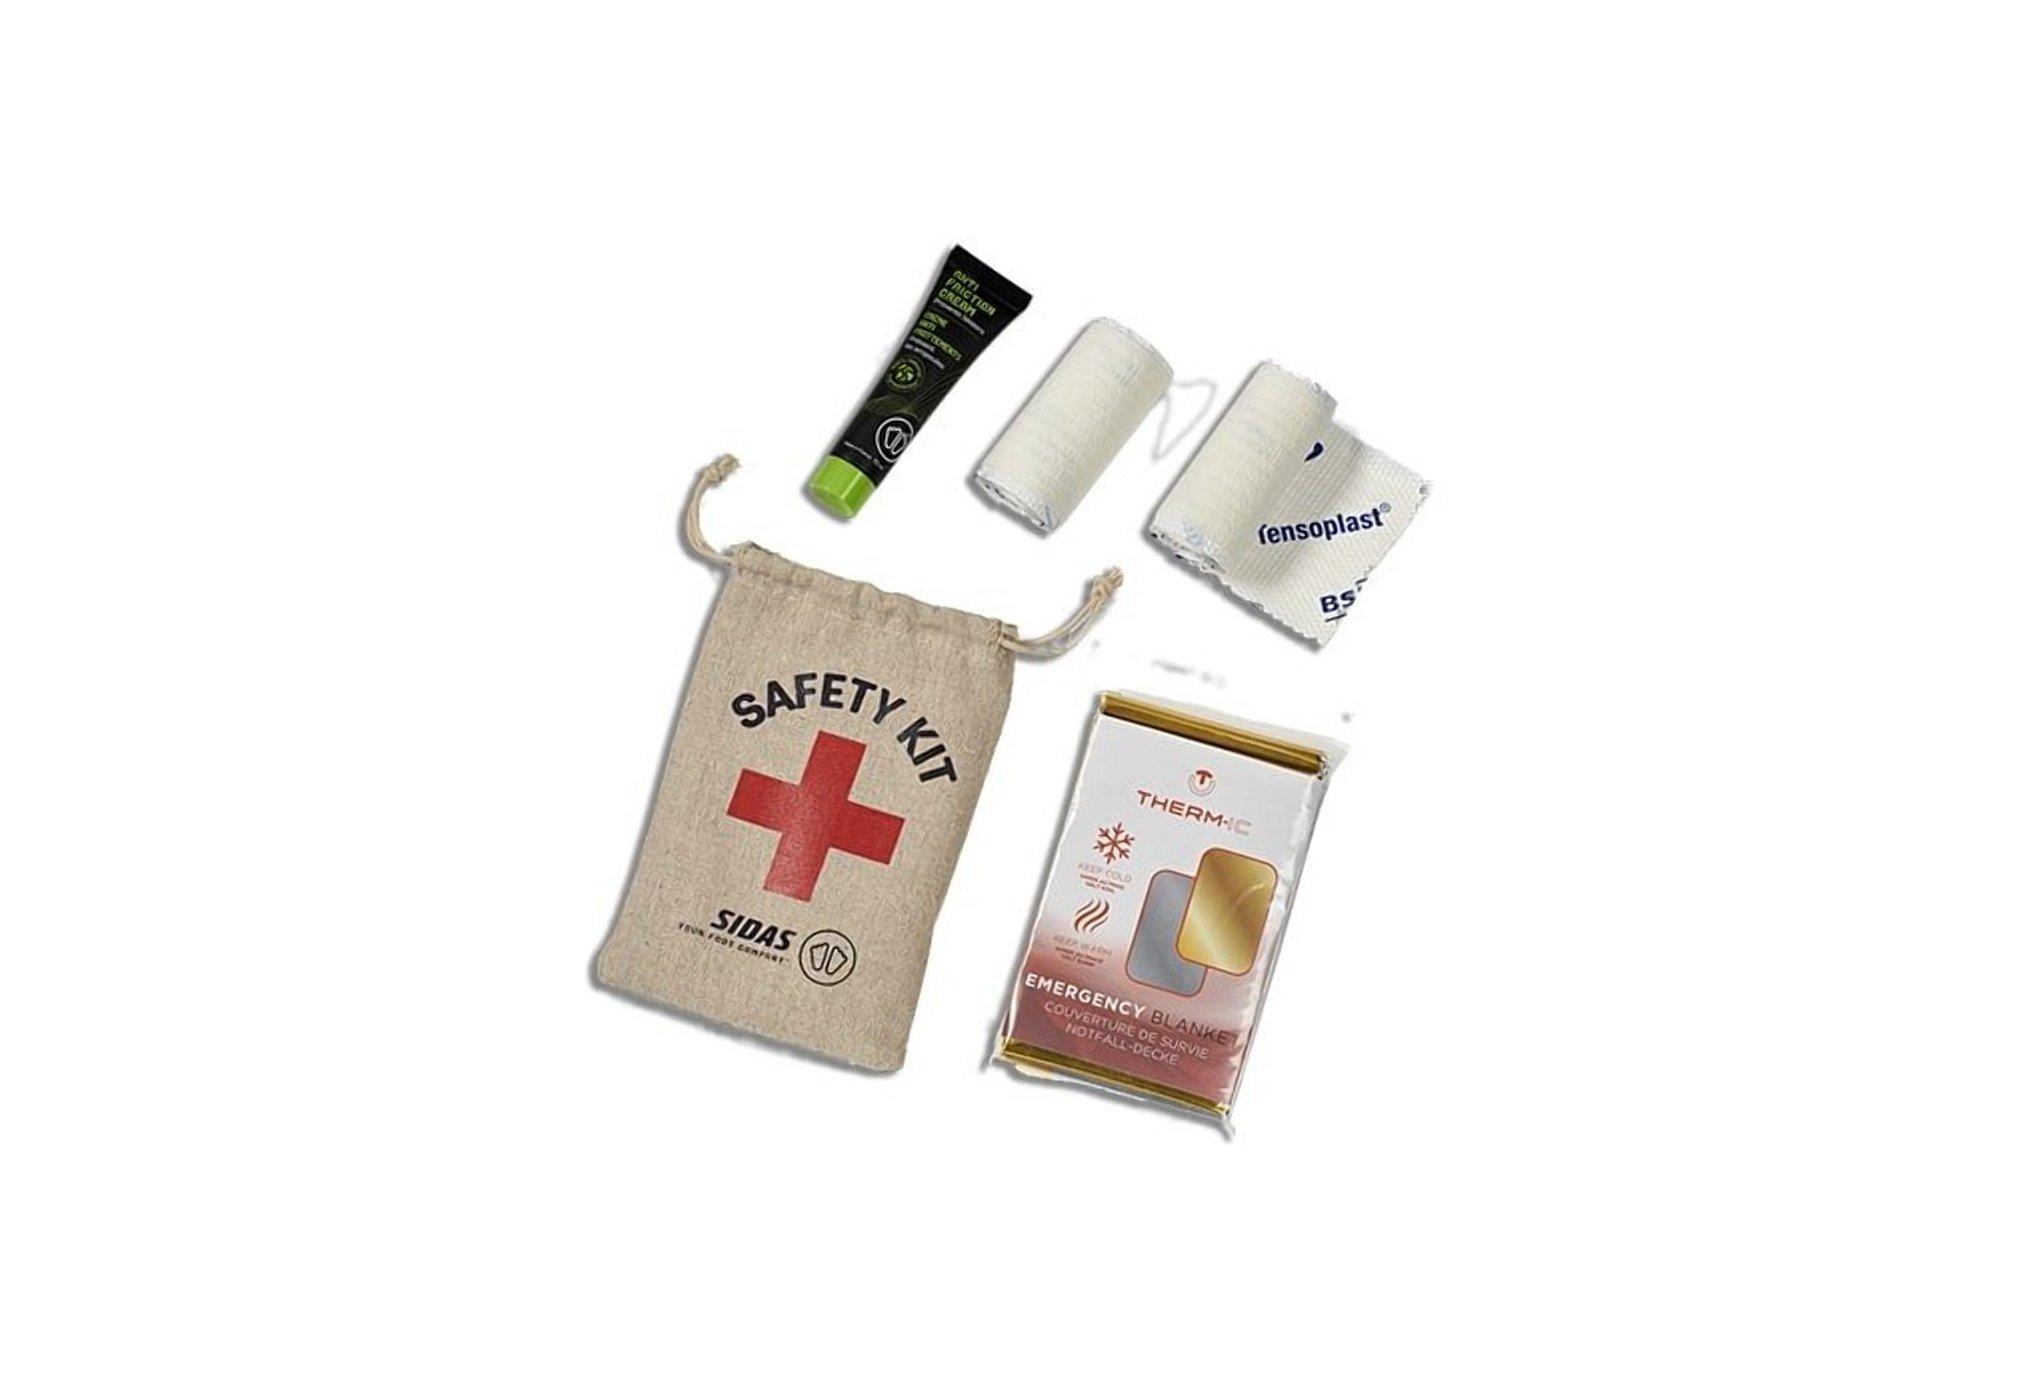 Sidas Safety Kit Sécurité